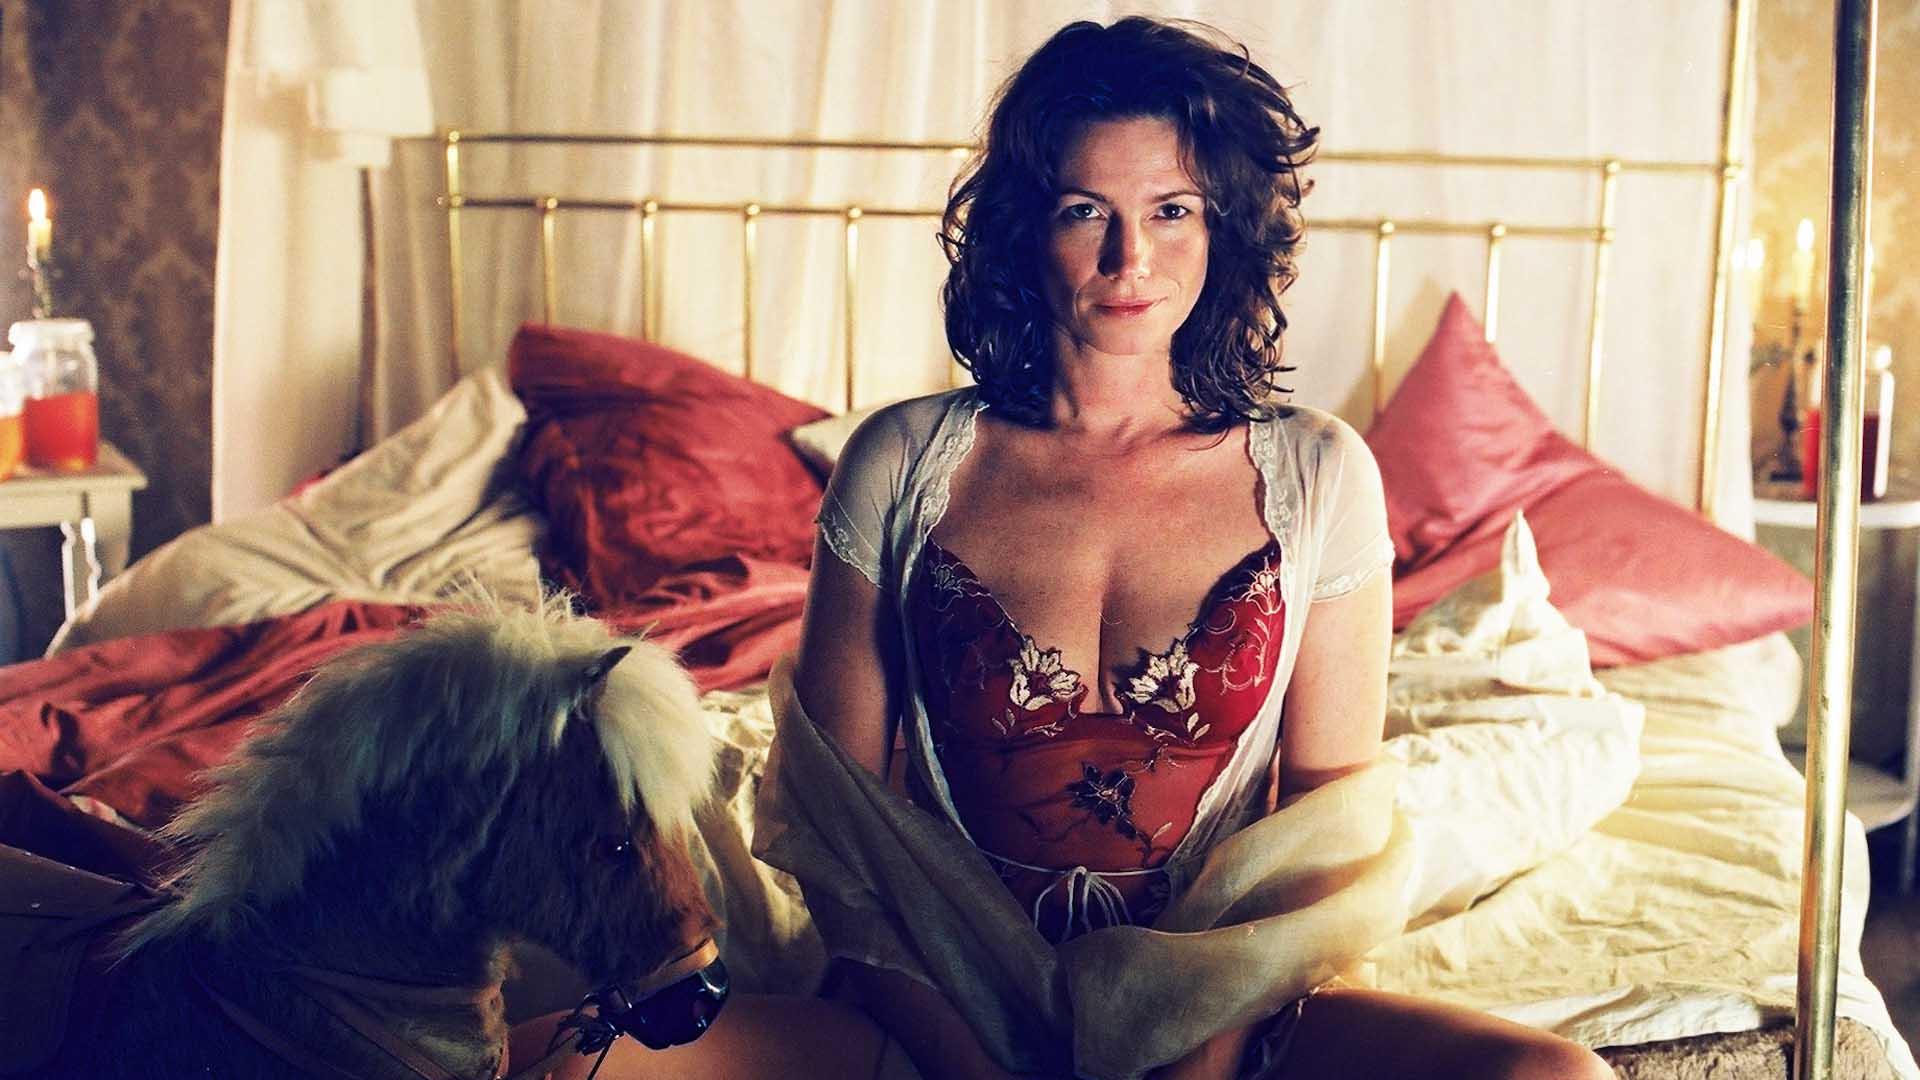 erotic tales tv jpg 1500x1000